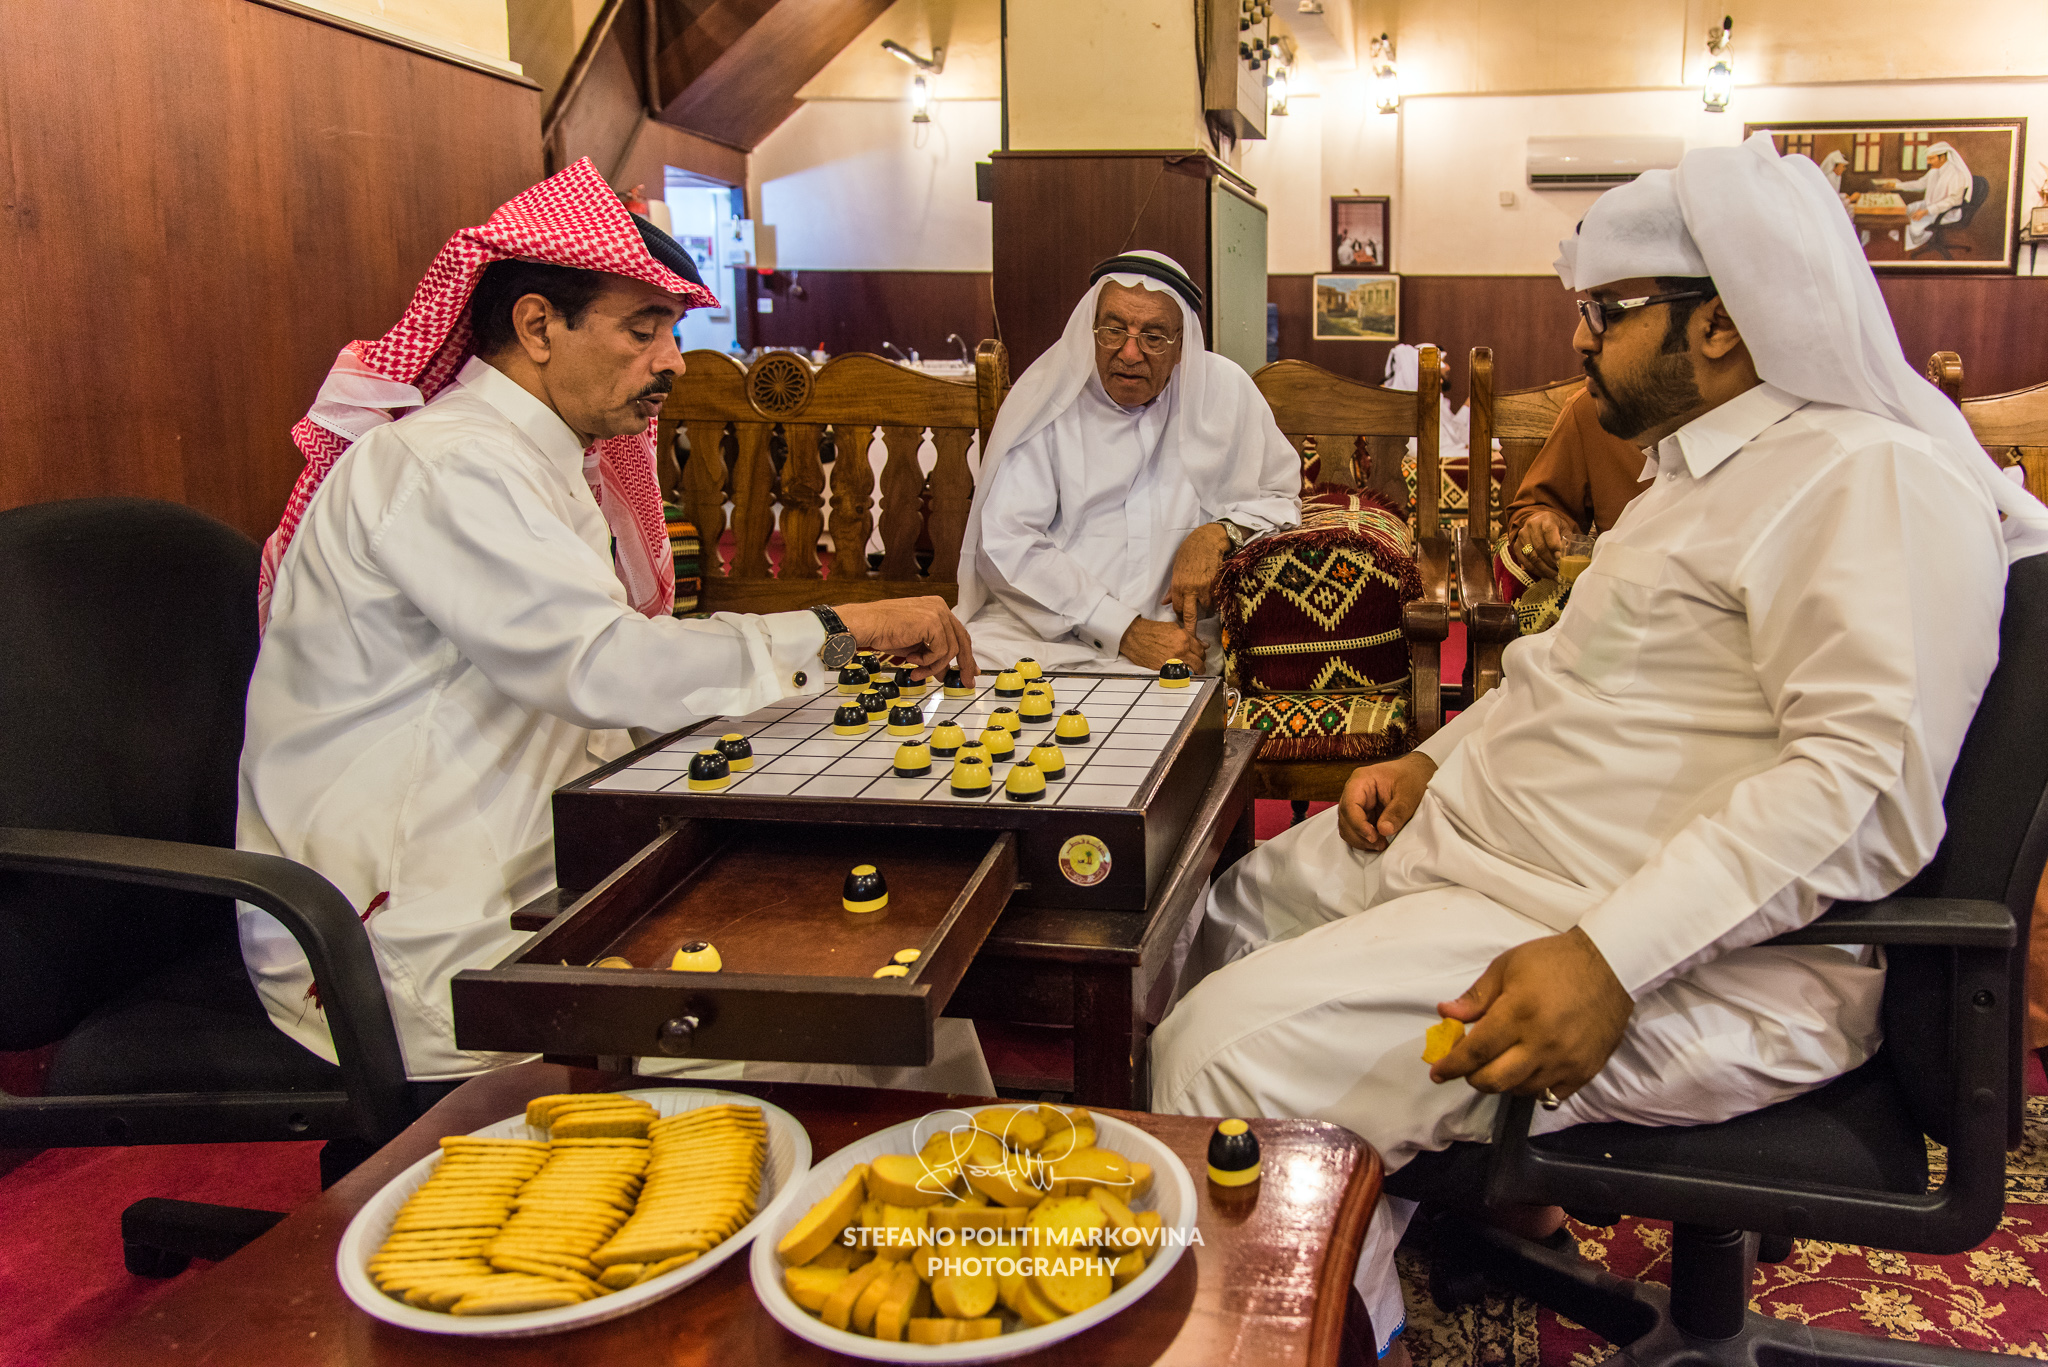 Playing aldama in Doha